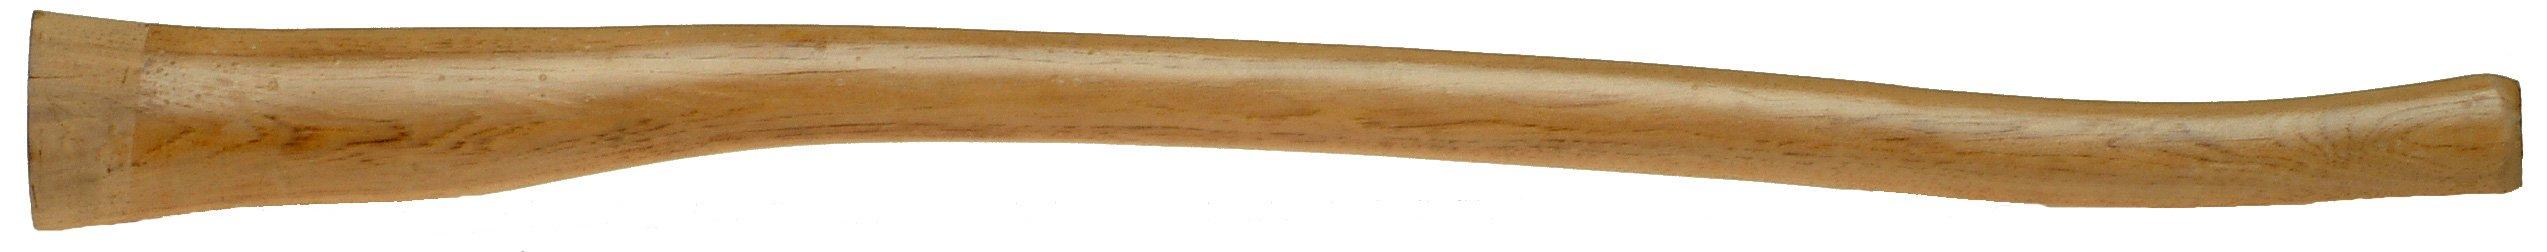 Link Handle 210-19 36'' Curved Grub Hoe Handle